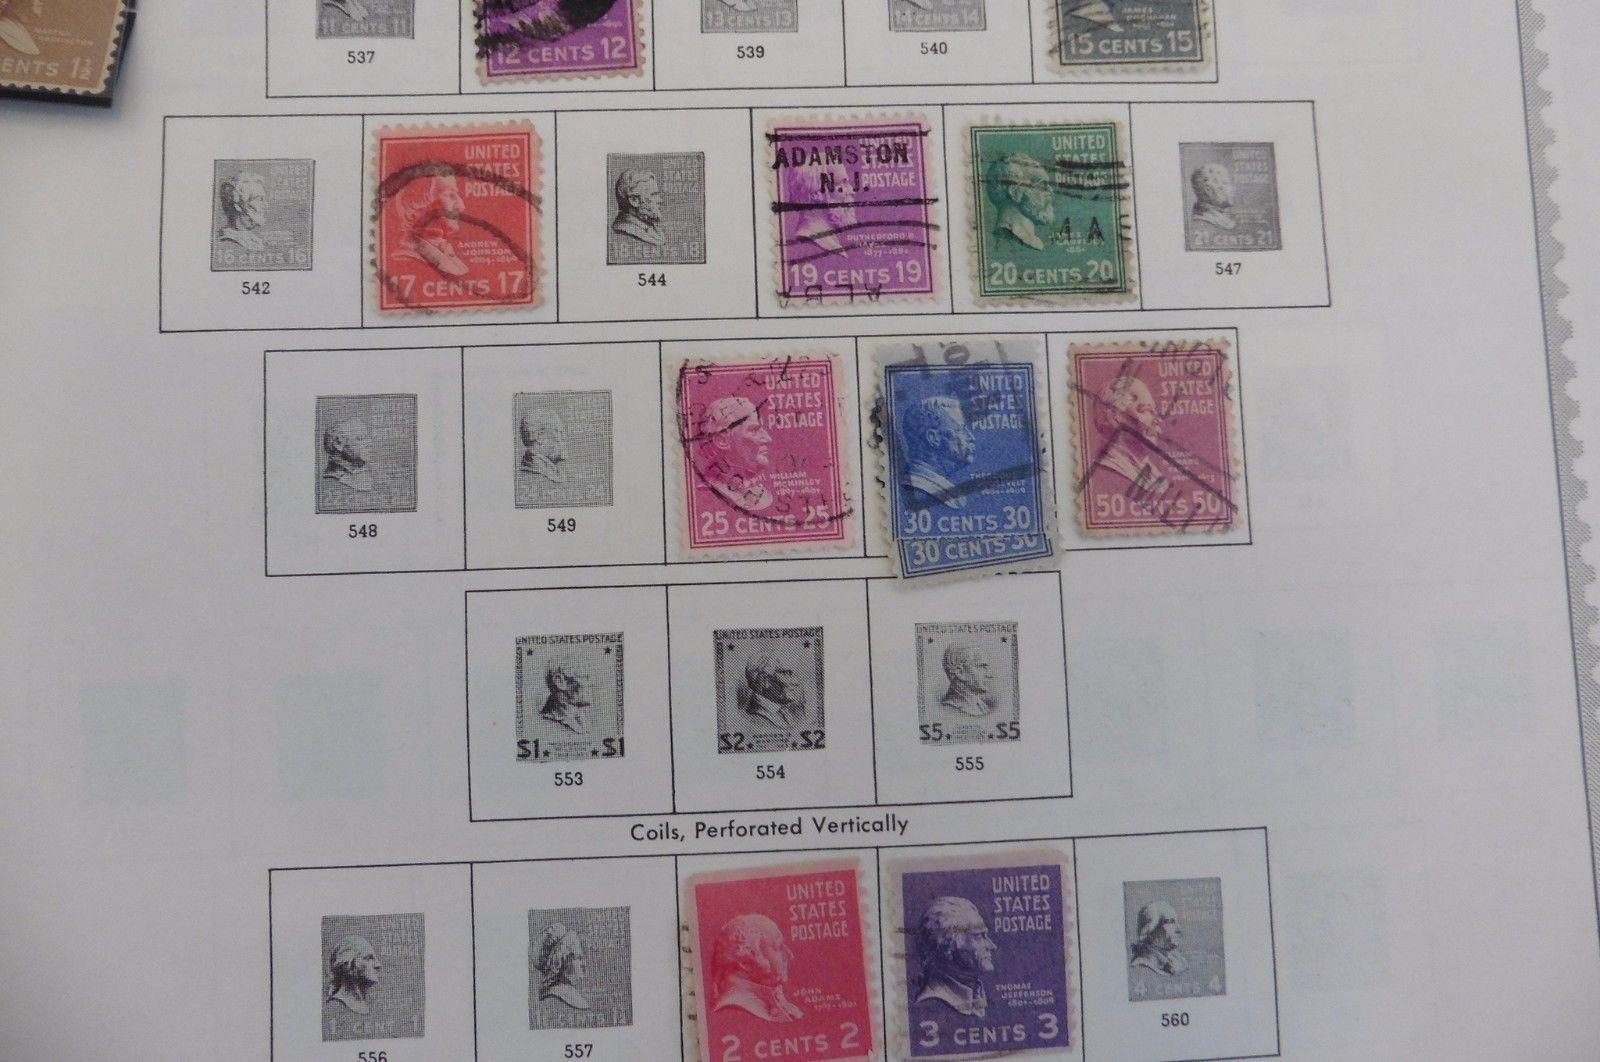 F28 United States of America USA Stamps Minkus Page 1926-34 1938-43